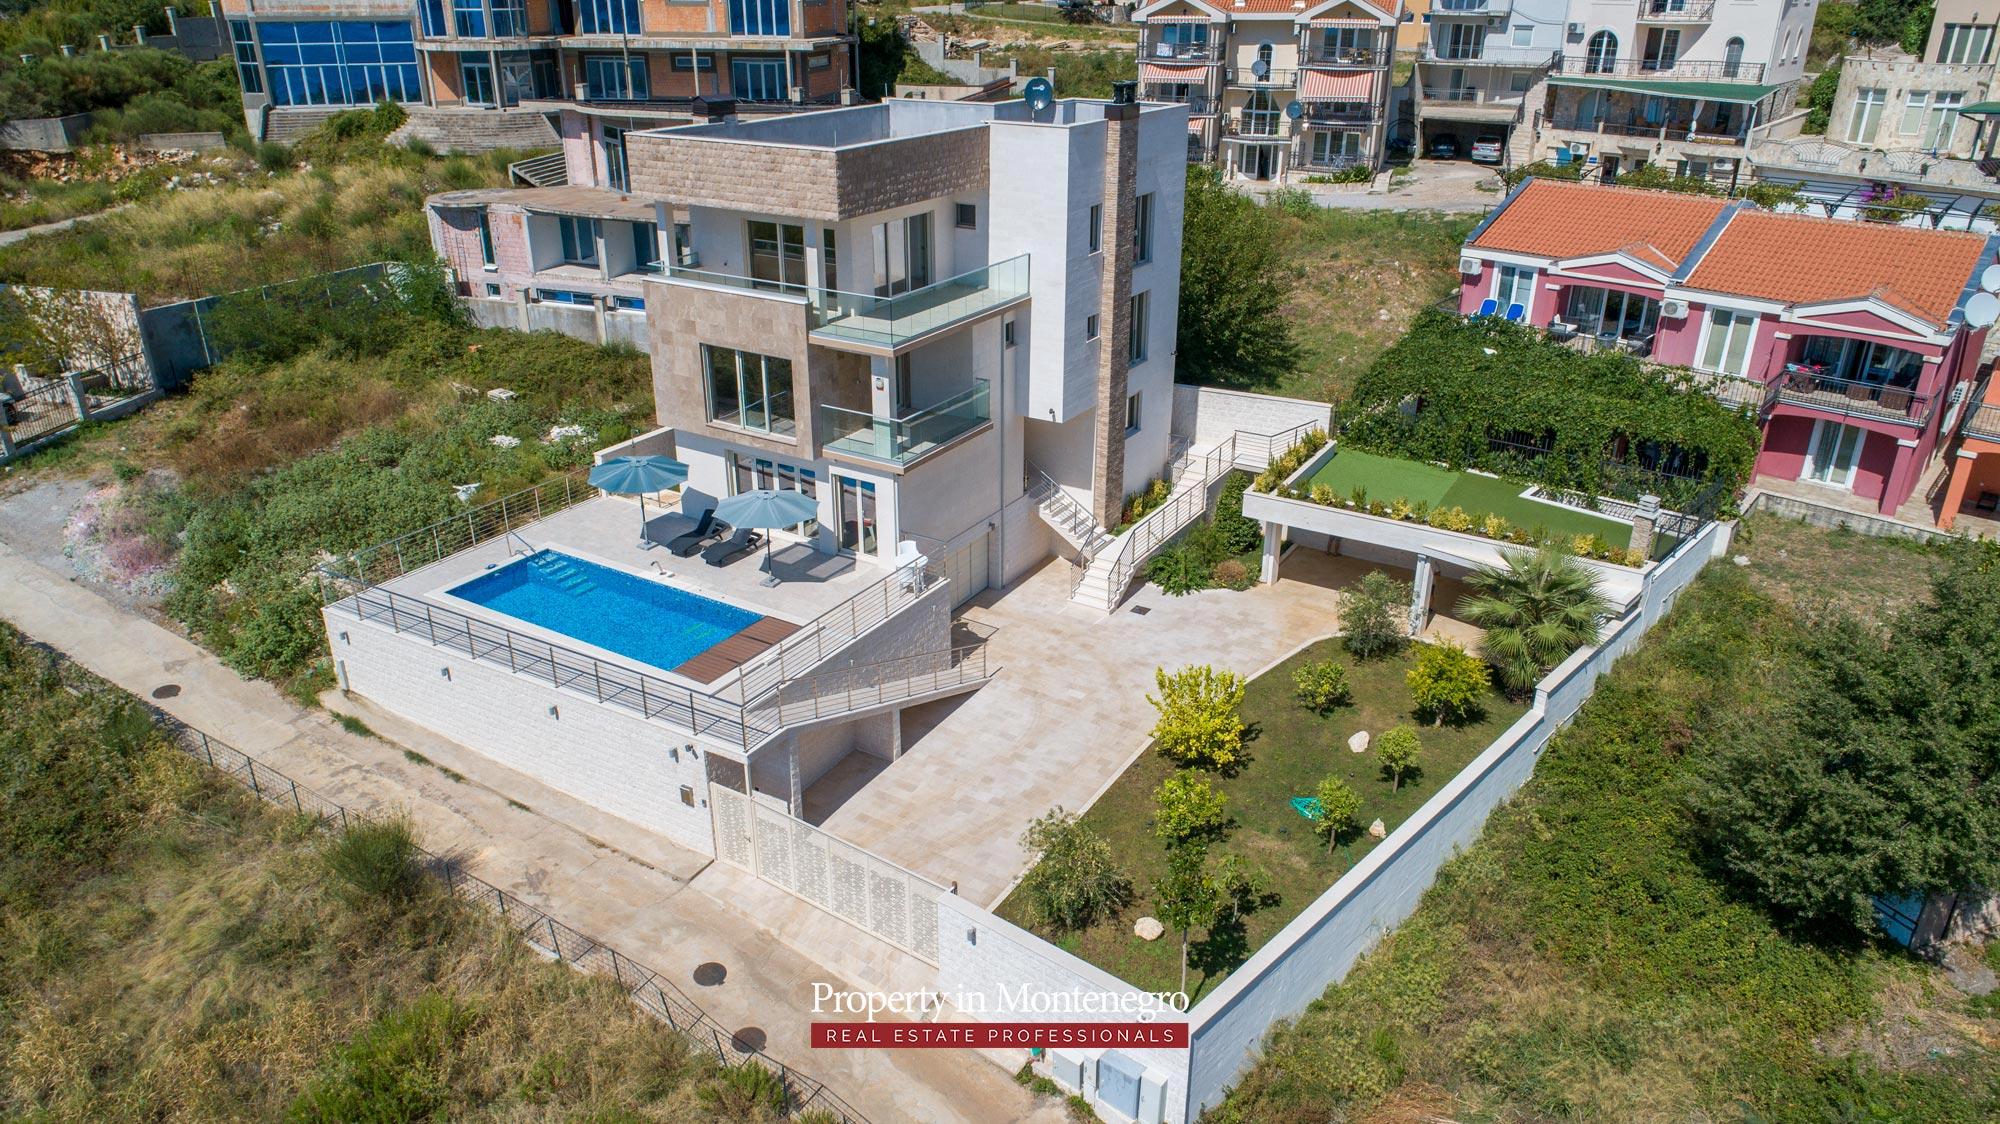 luxury-villa-with-swimming-pool-for-sale-in-Budva (46).jpg